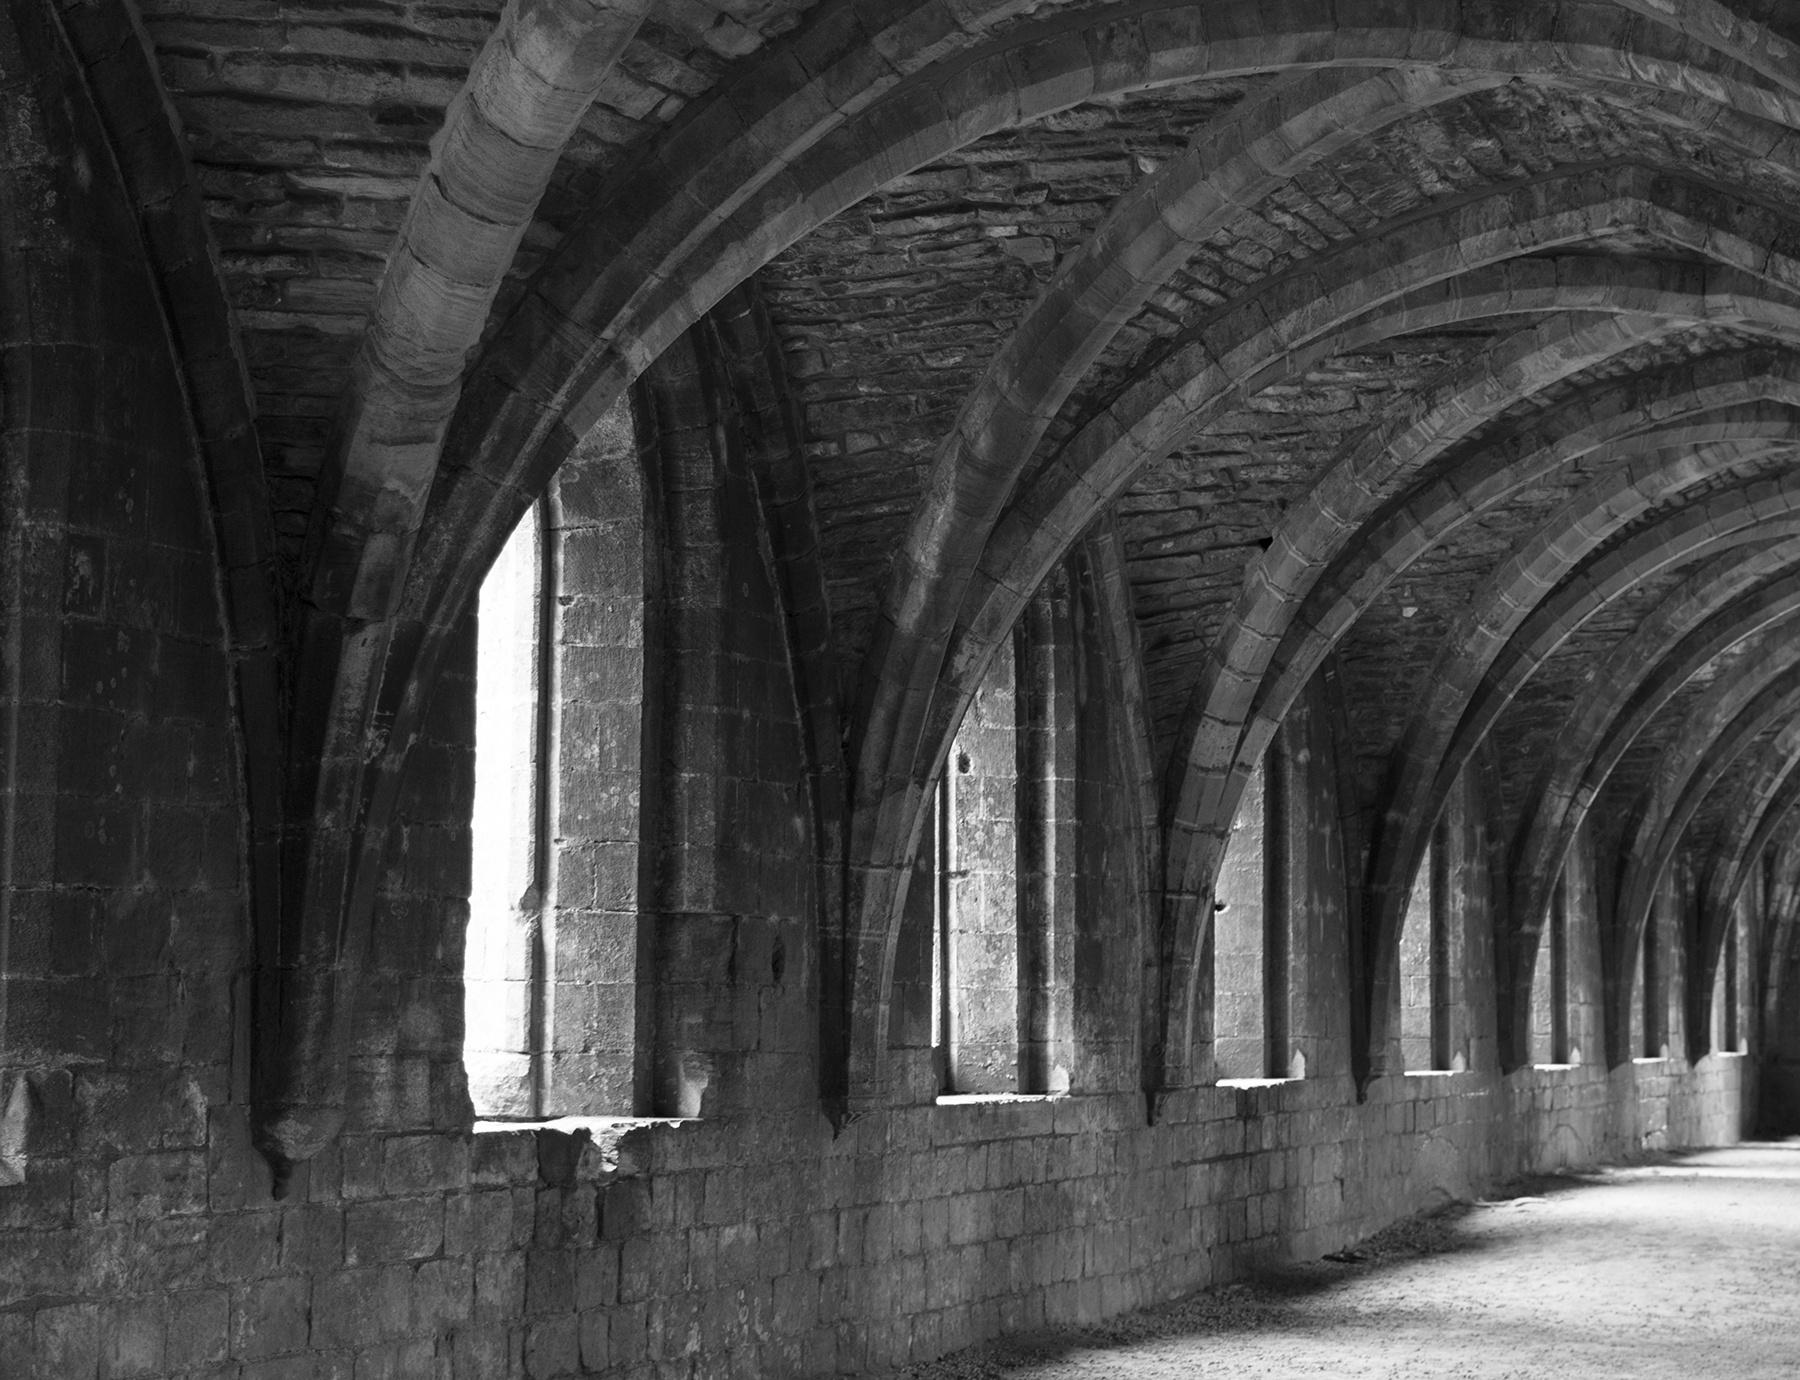 Fountains Abbey Window Openings by Ian M